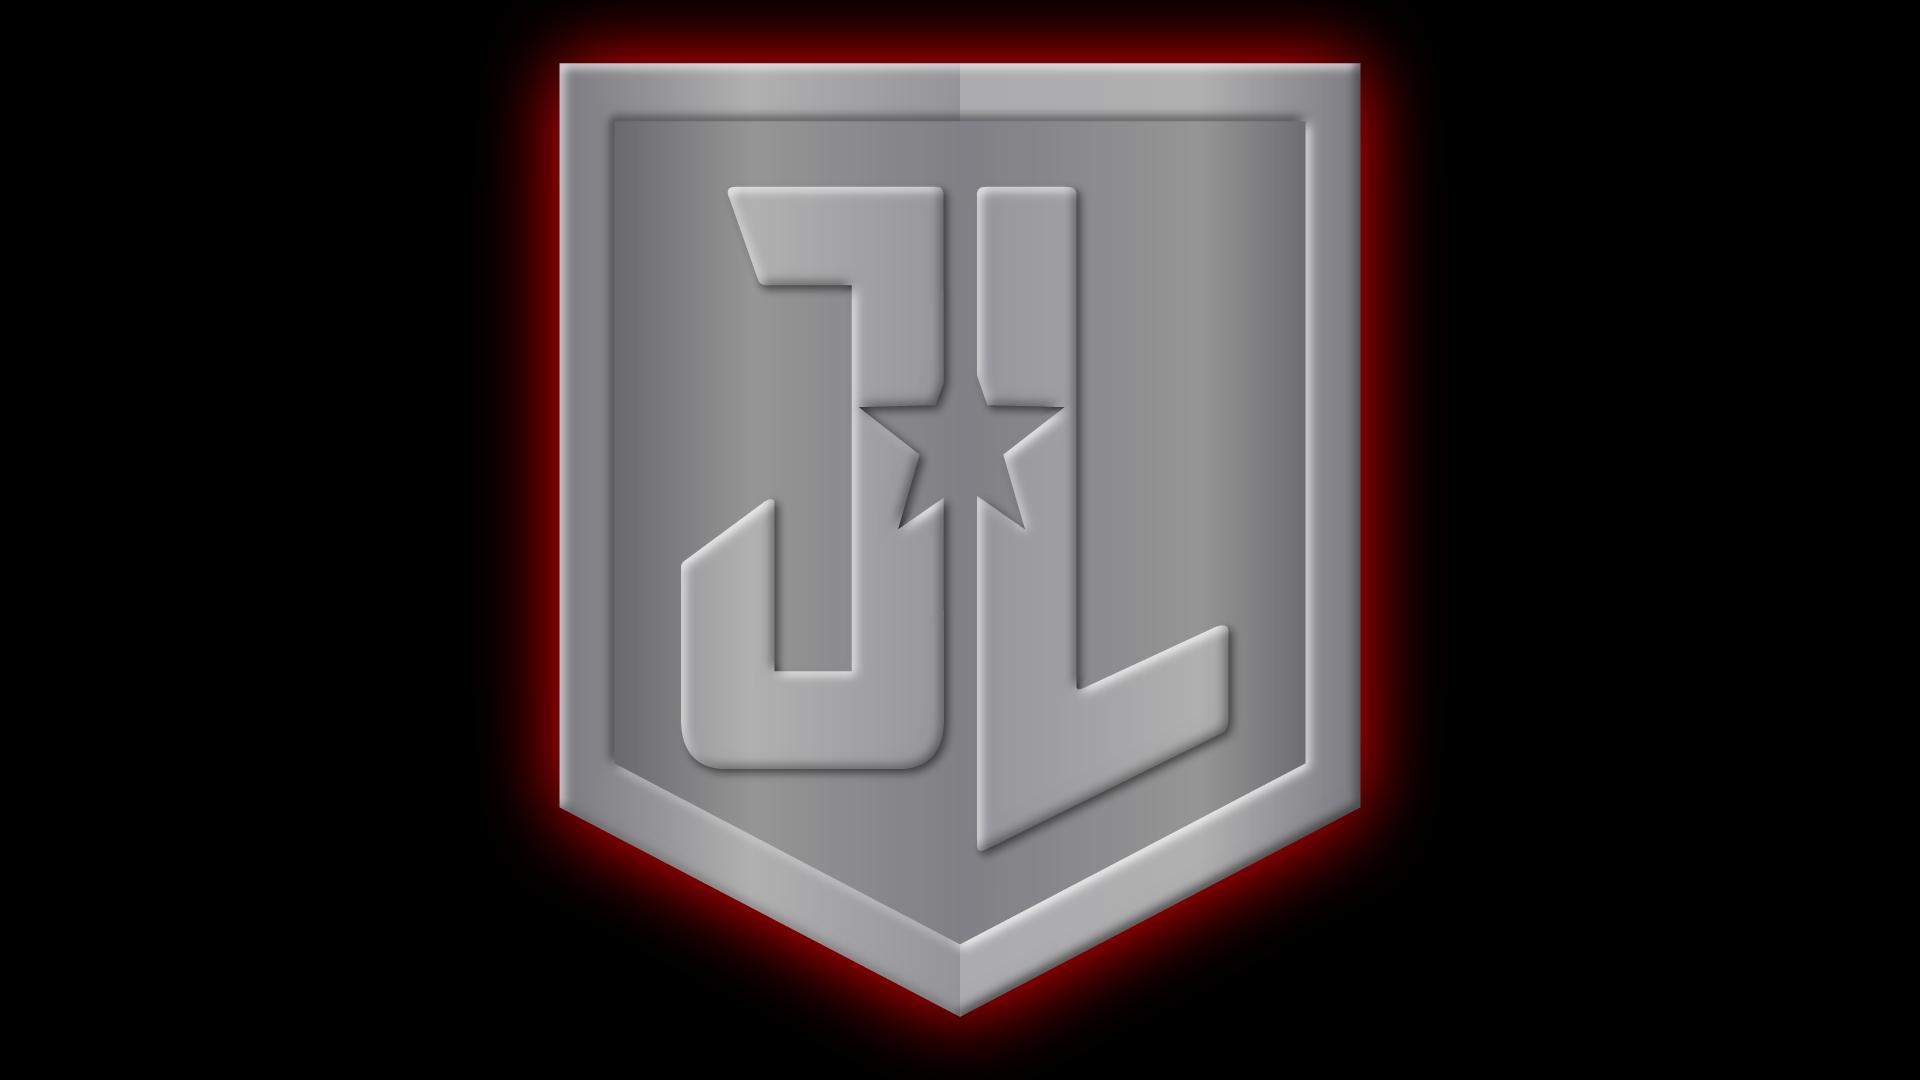 Justice league symbol by yurtigo on deviantart justice league symbol by yurtigo justice league symbol by yurtigo buycottarizona